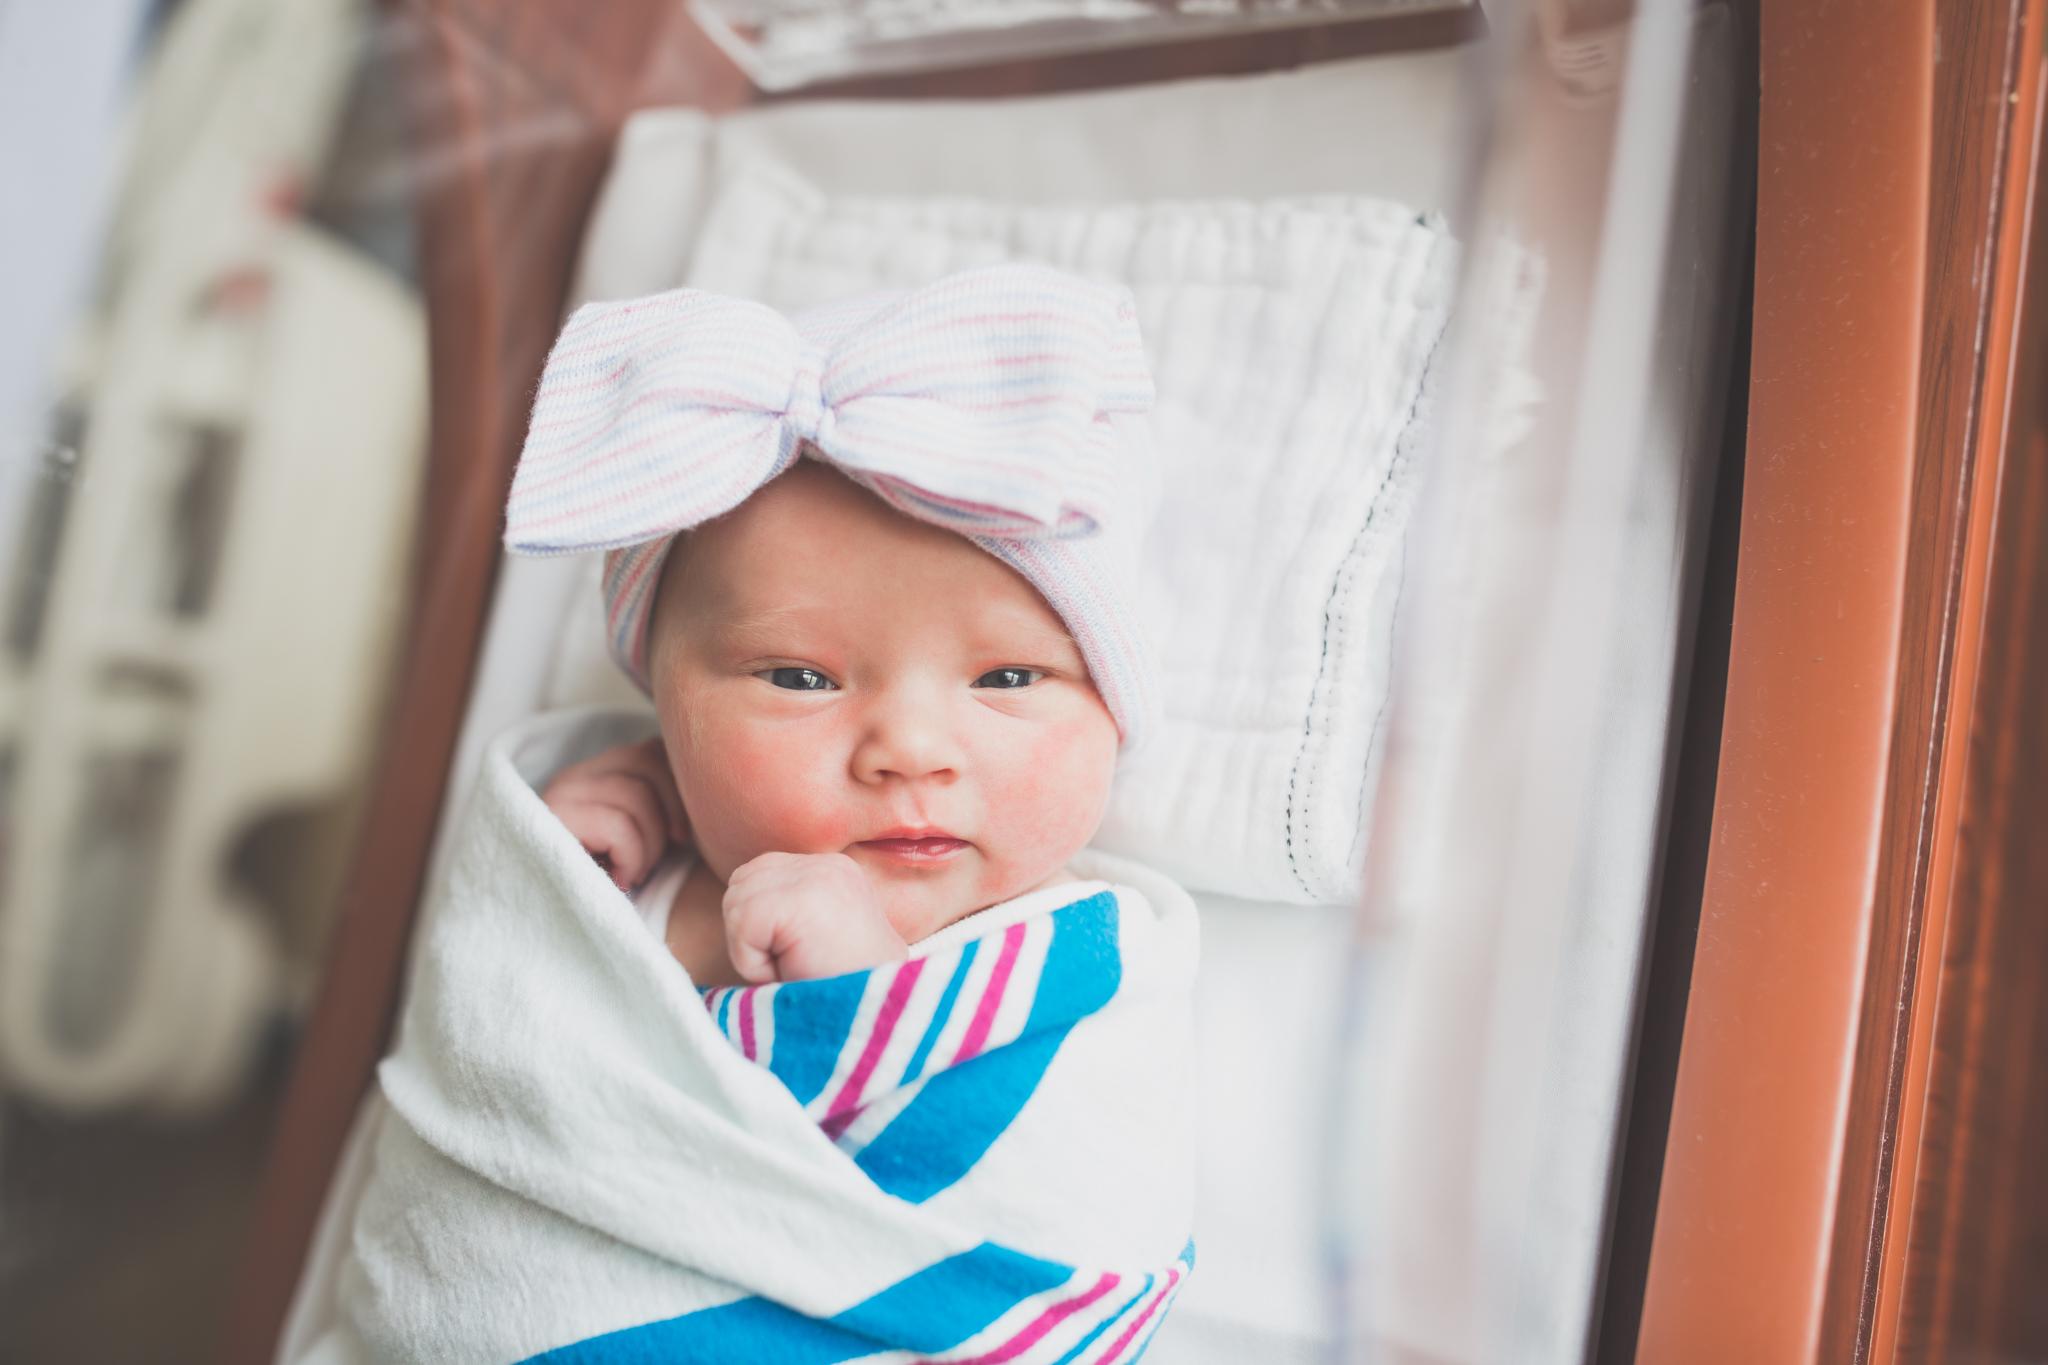 cara peterson photography maternity newborn photos mom dad -3.jpg